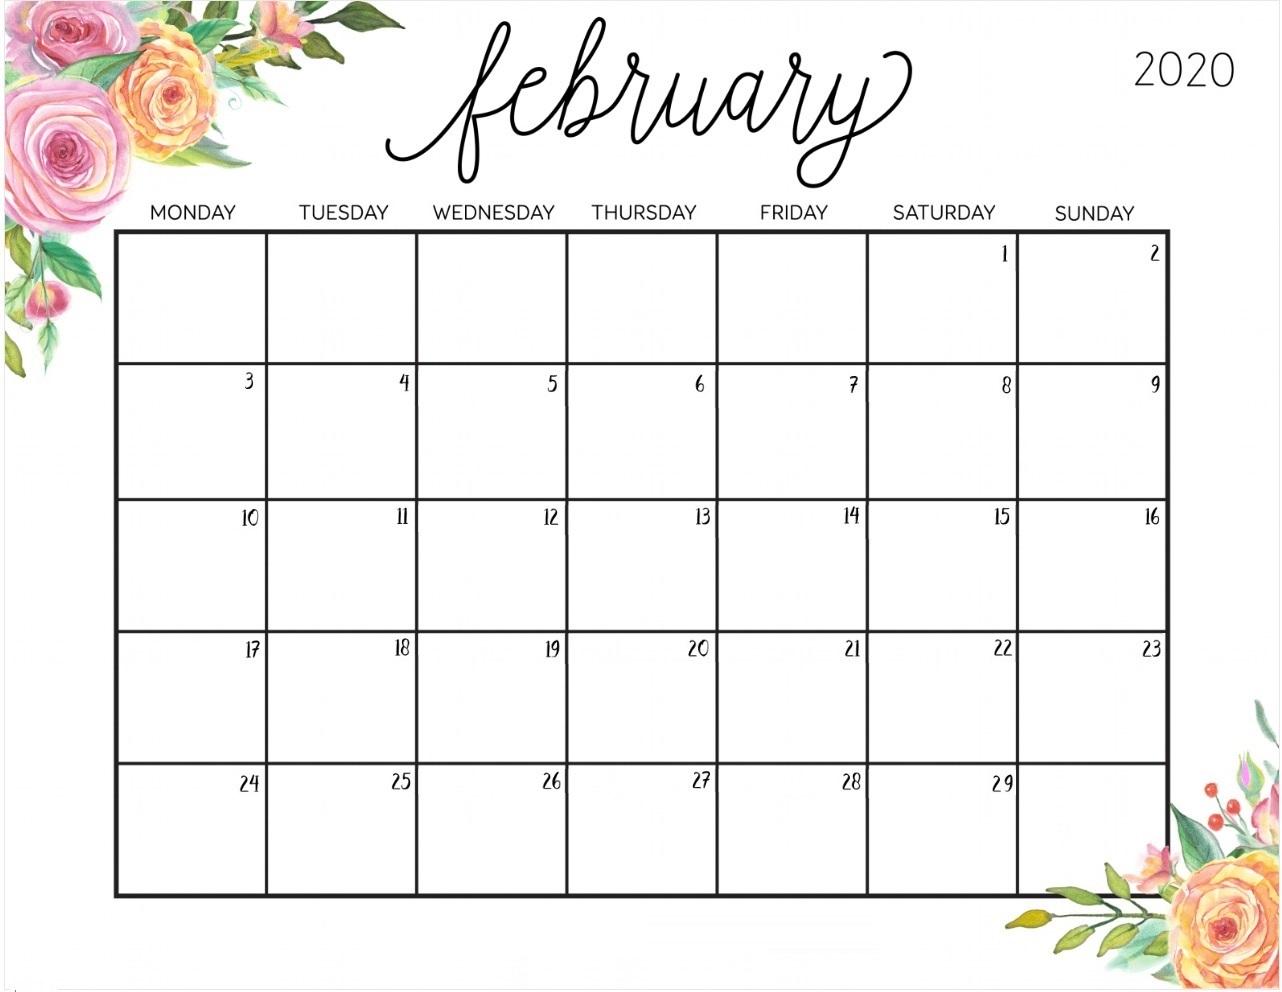 Floral February 2020 Cute Calendar